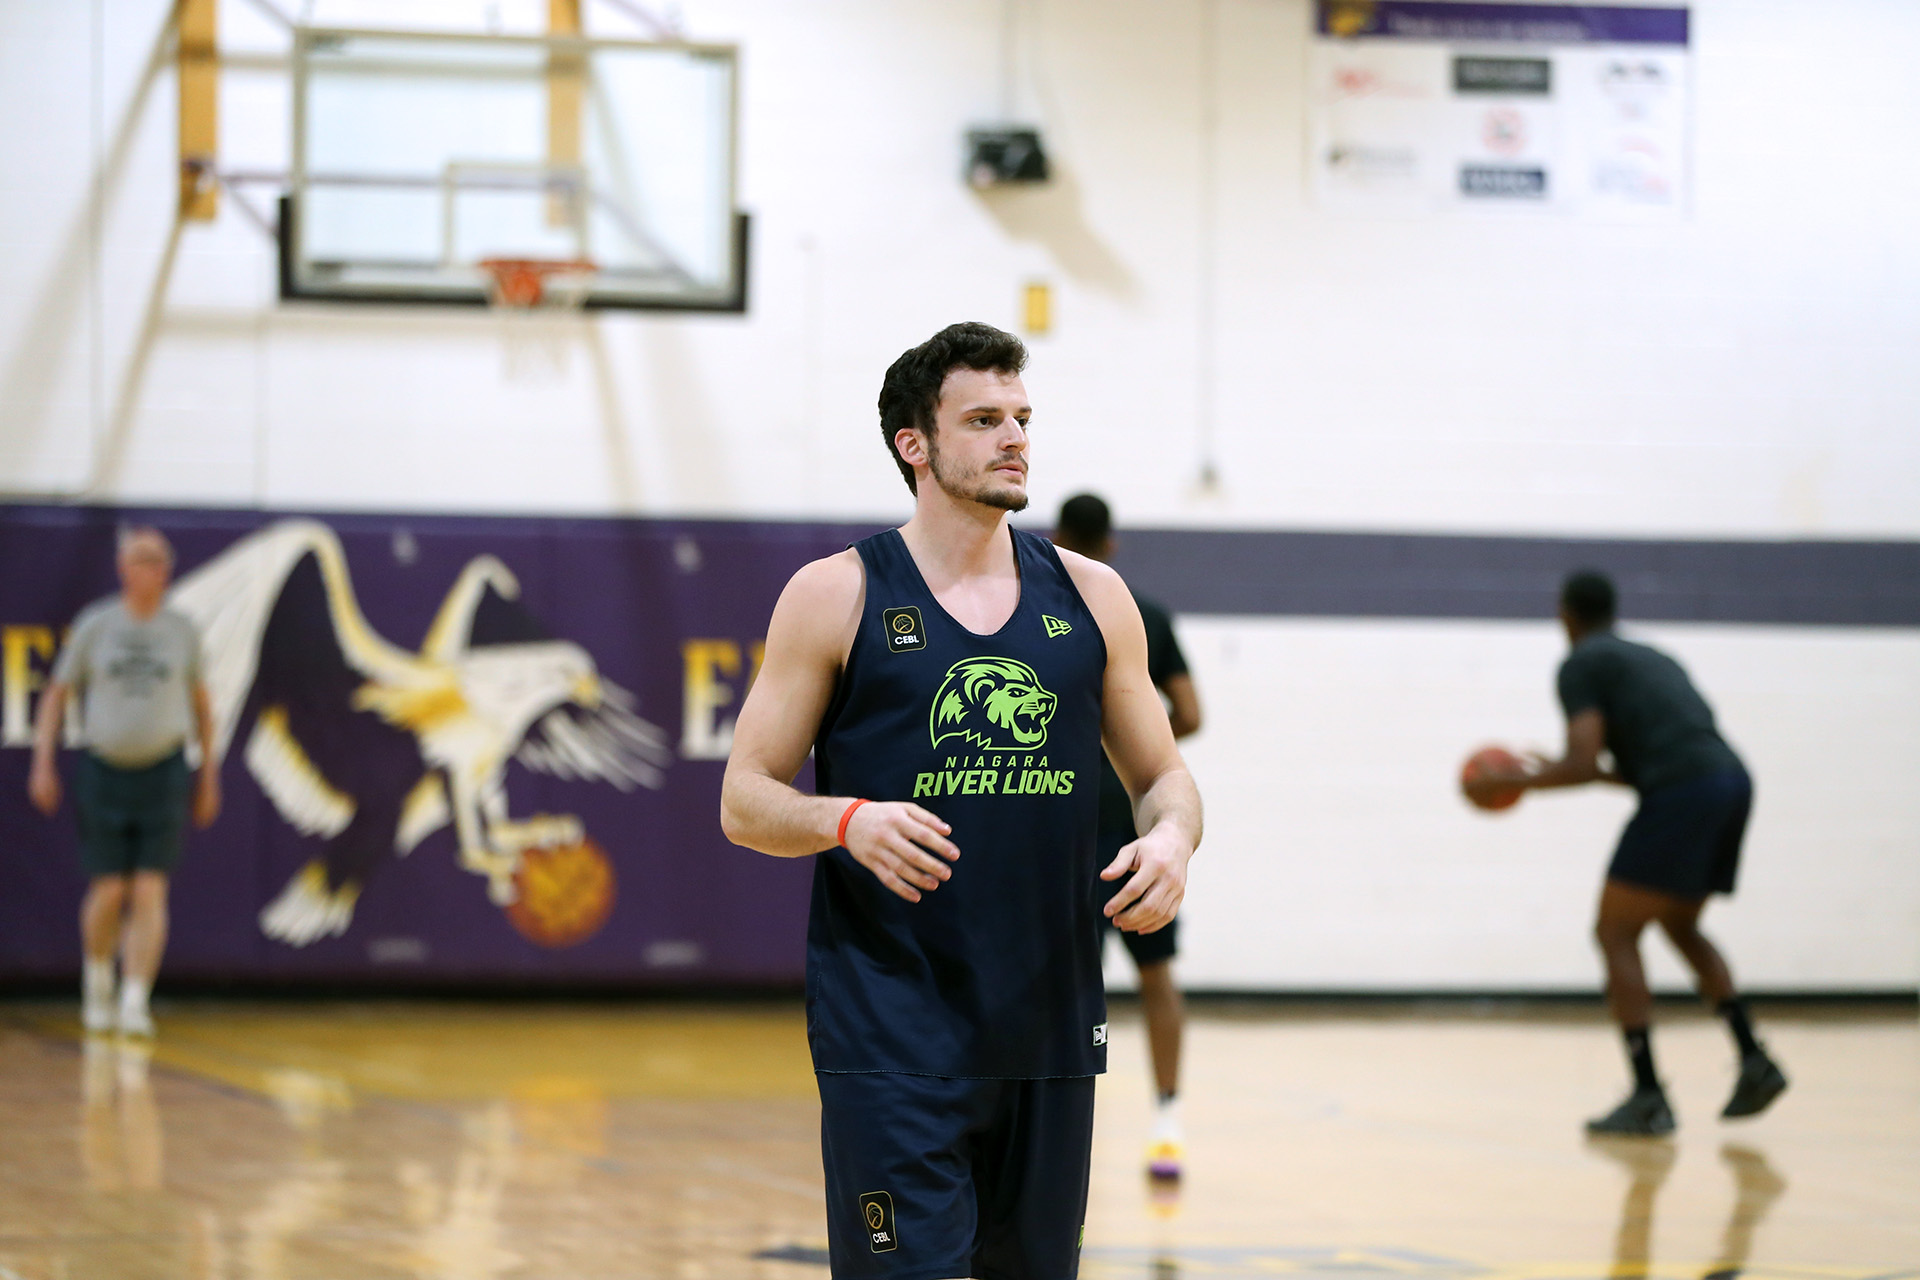 For Niagara River Lions' Filip Vujadinovic, adversity fuels a basketball career